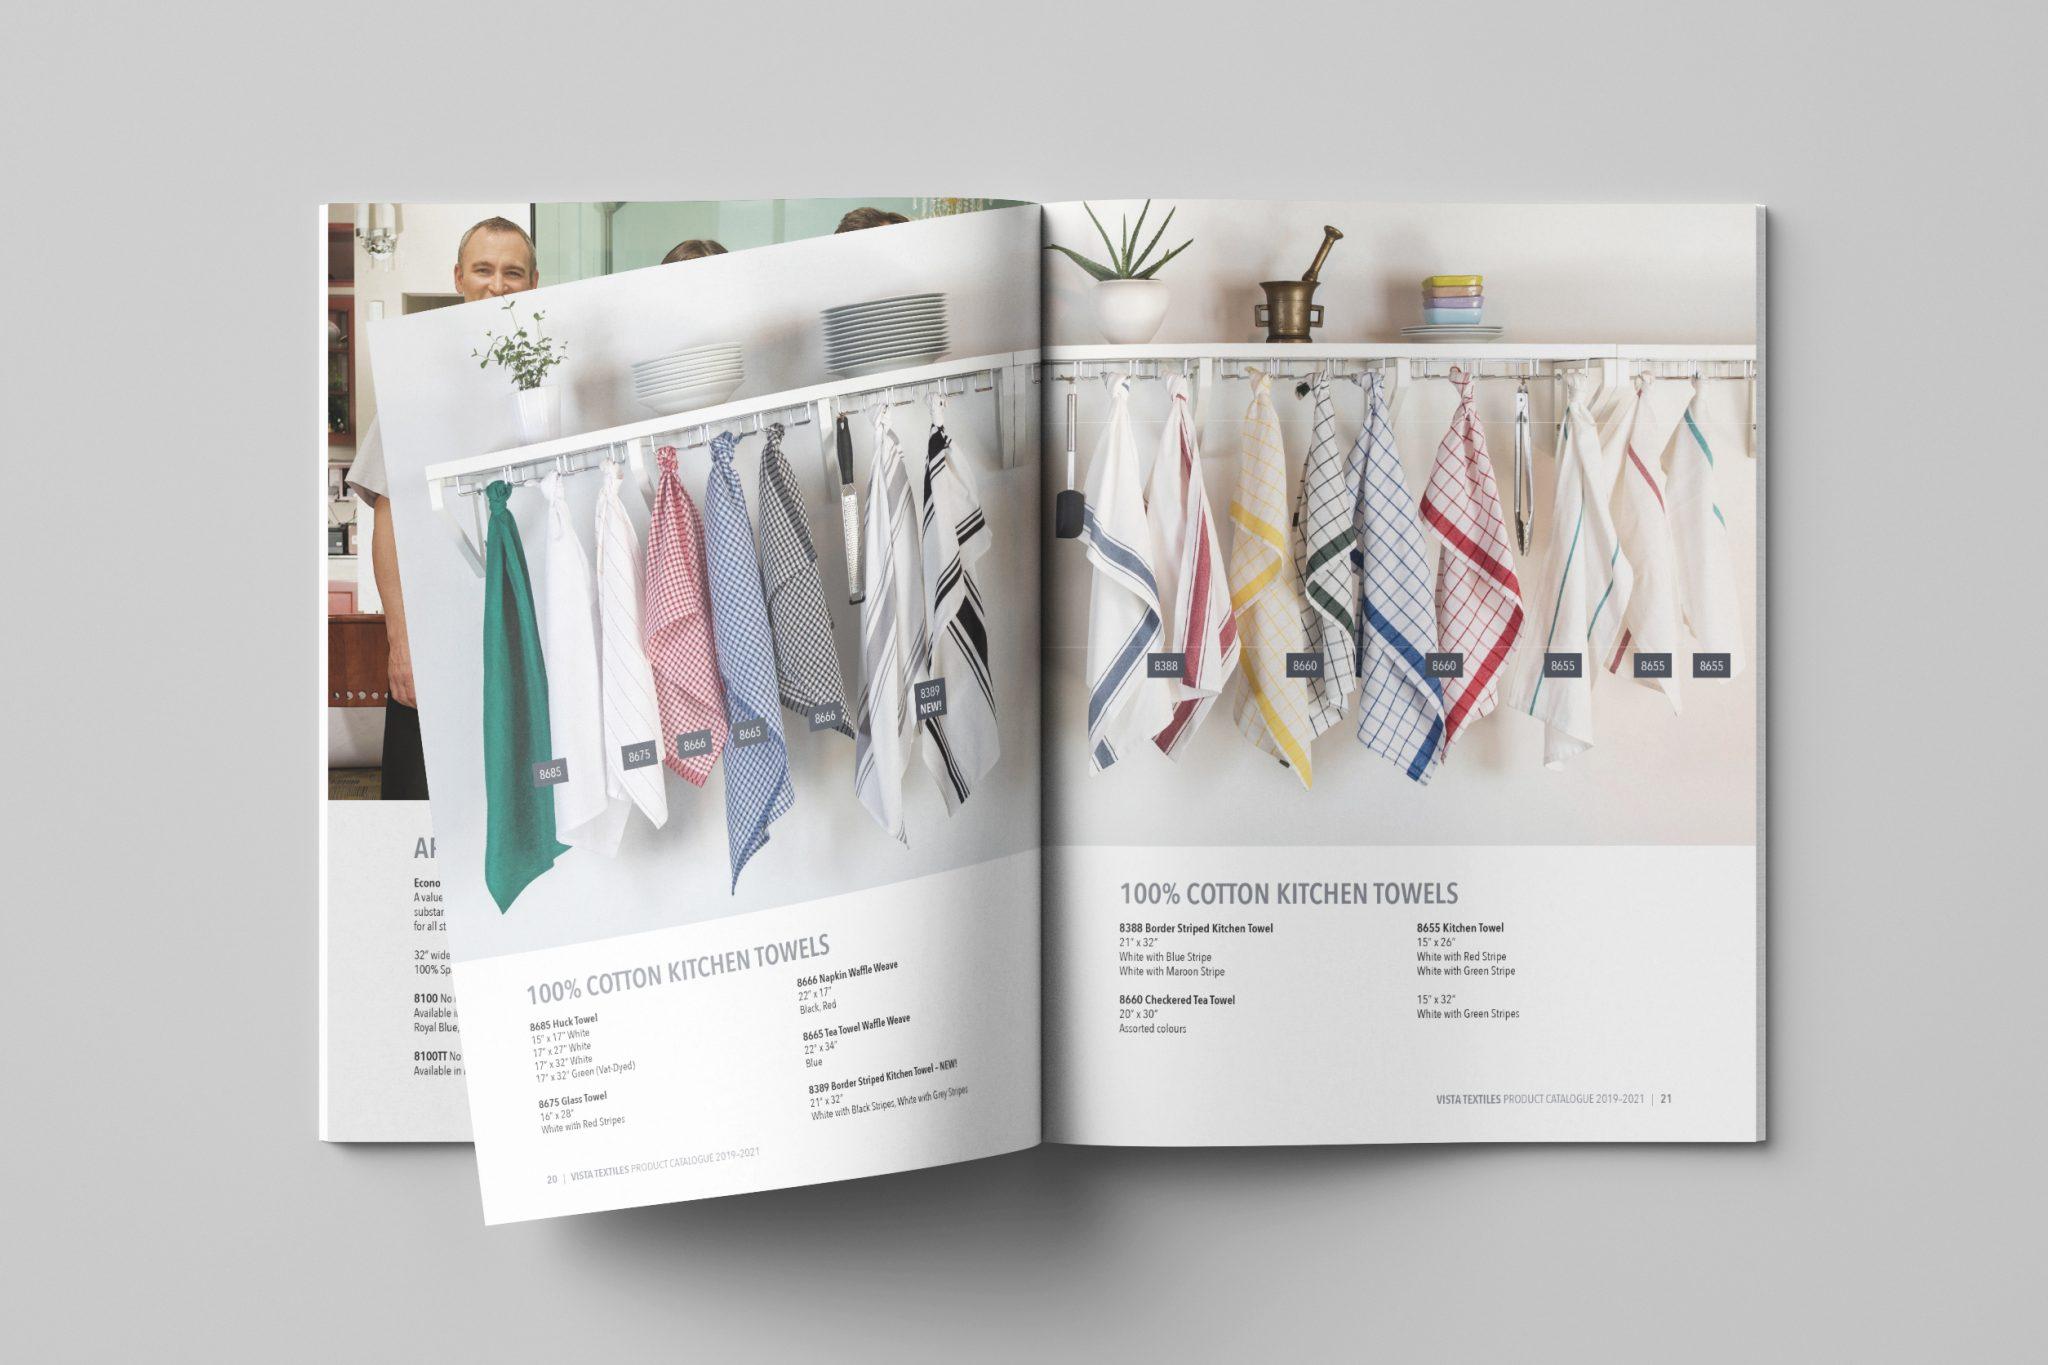 vista-textiles-catalog-spread-3